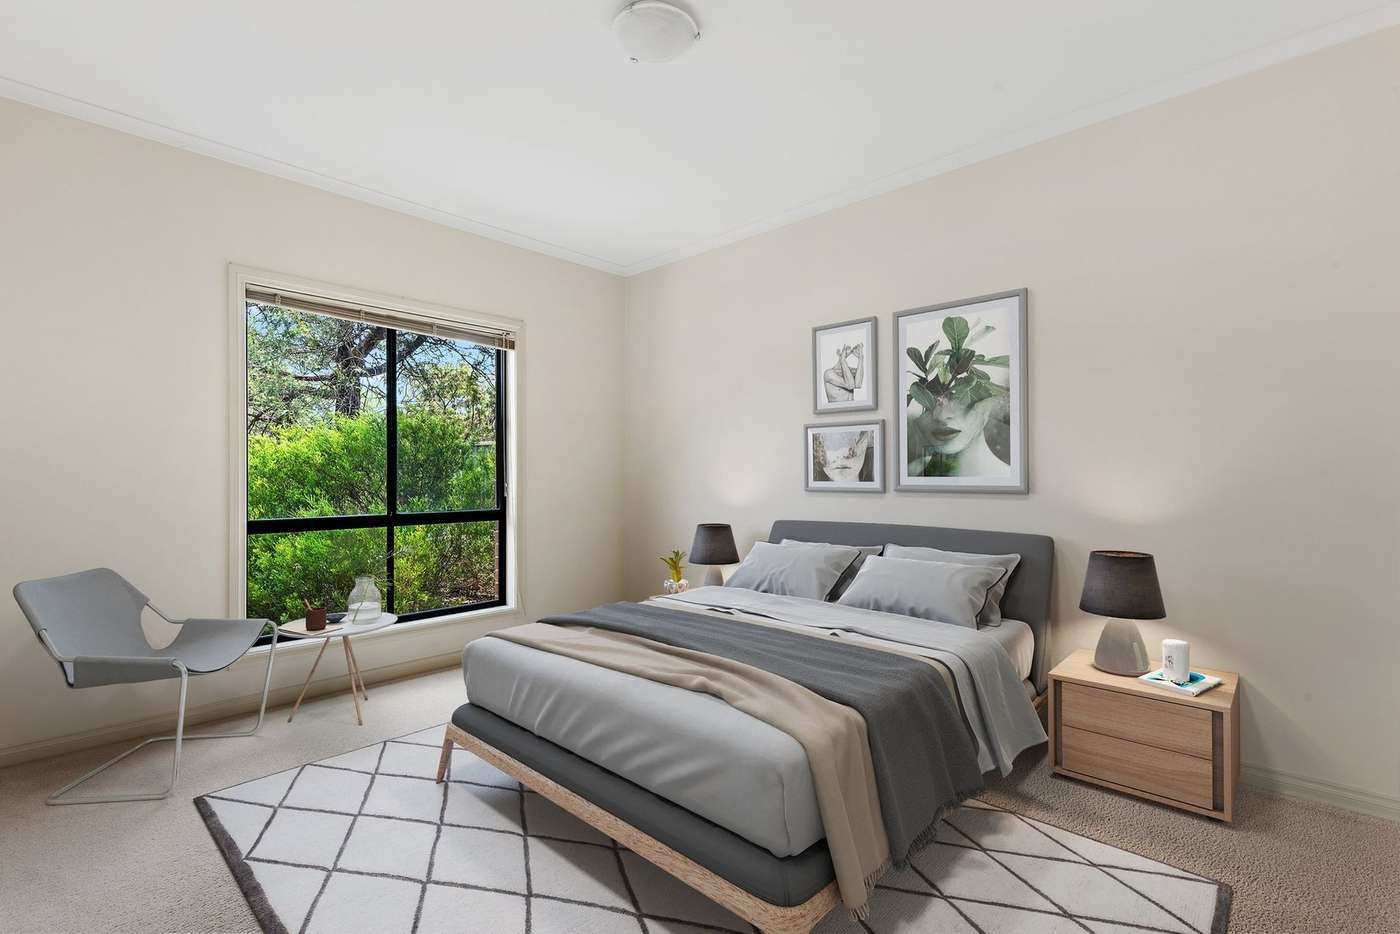 Sixth view of Homely house listing, 19 Irkara Drive, Kennington VIC 3550